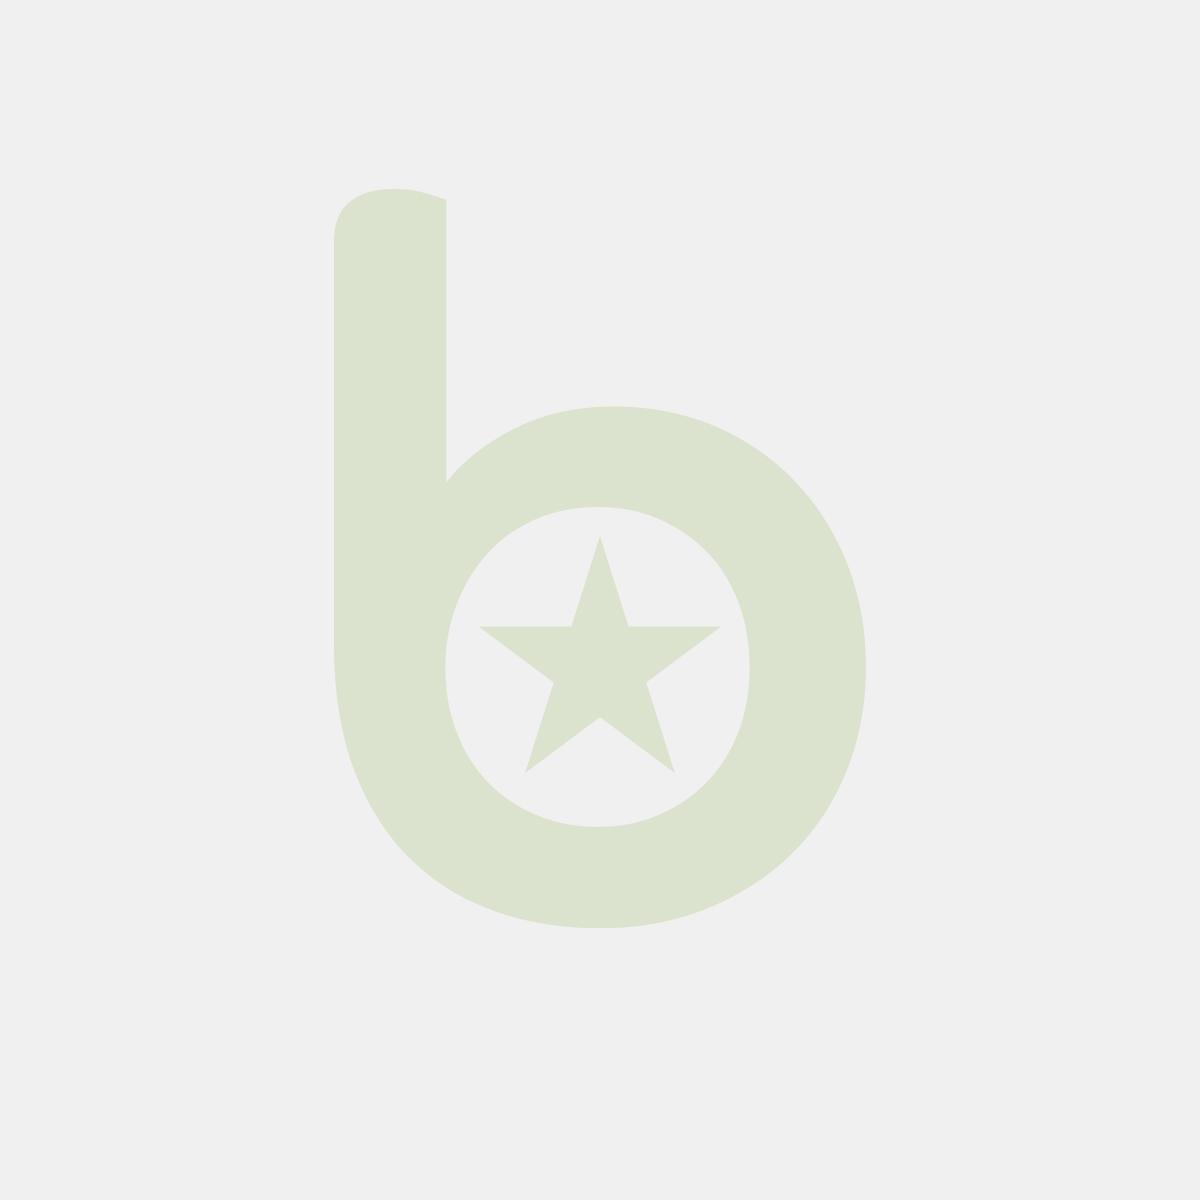 Bloczek samoprzylepny POST-IT® Super sticky, (6844-L-NB), 152x102mm, 45 kart., zawieszka, niebieski